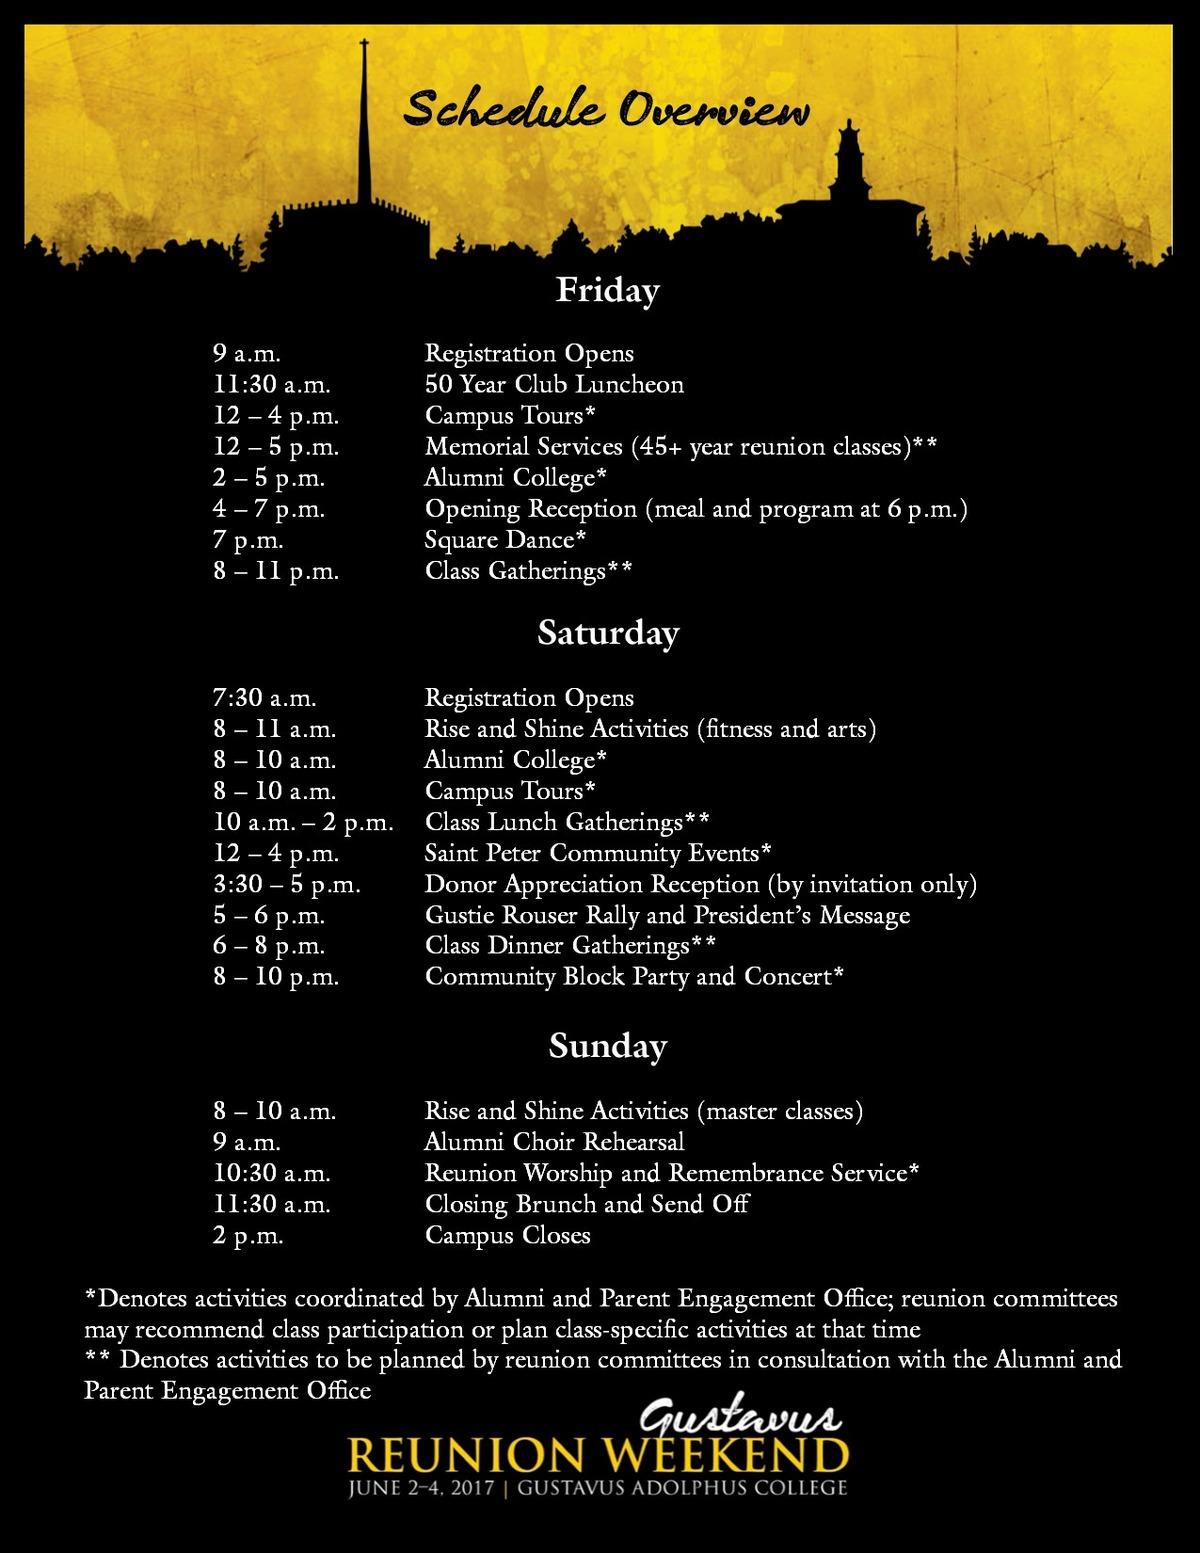 Reunion Weekend 2017 Tentative Schedule